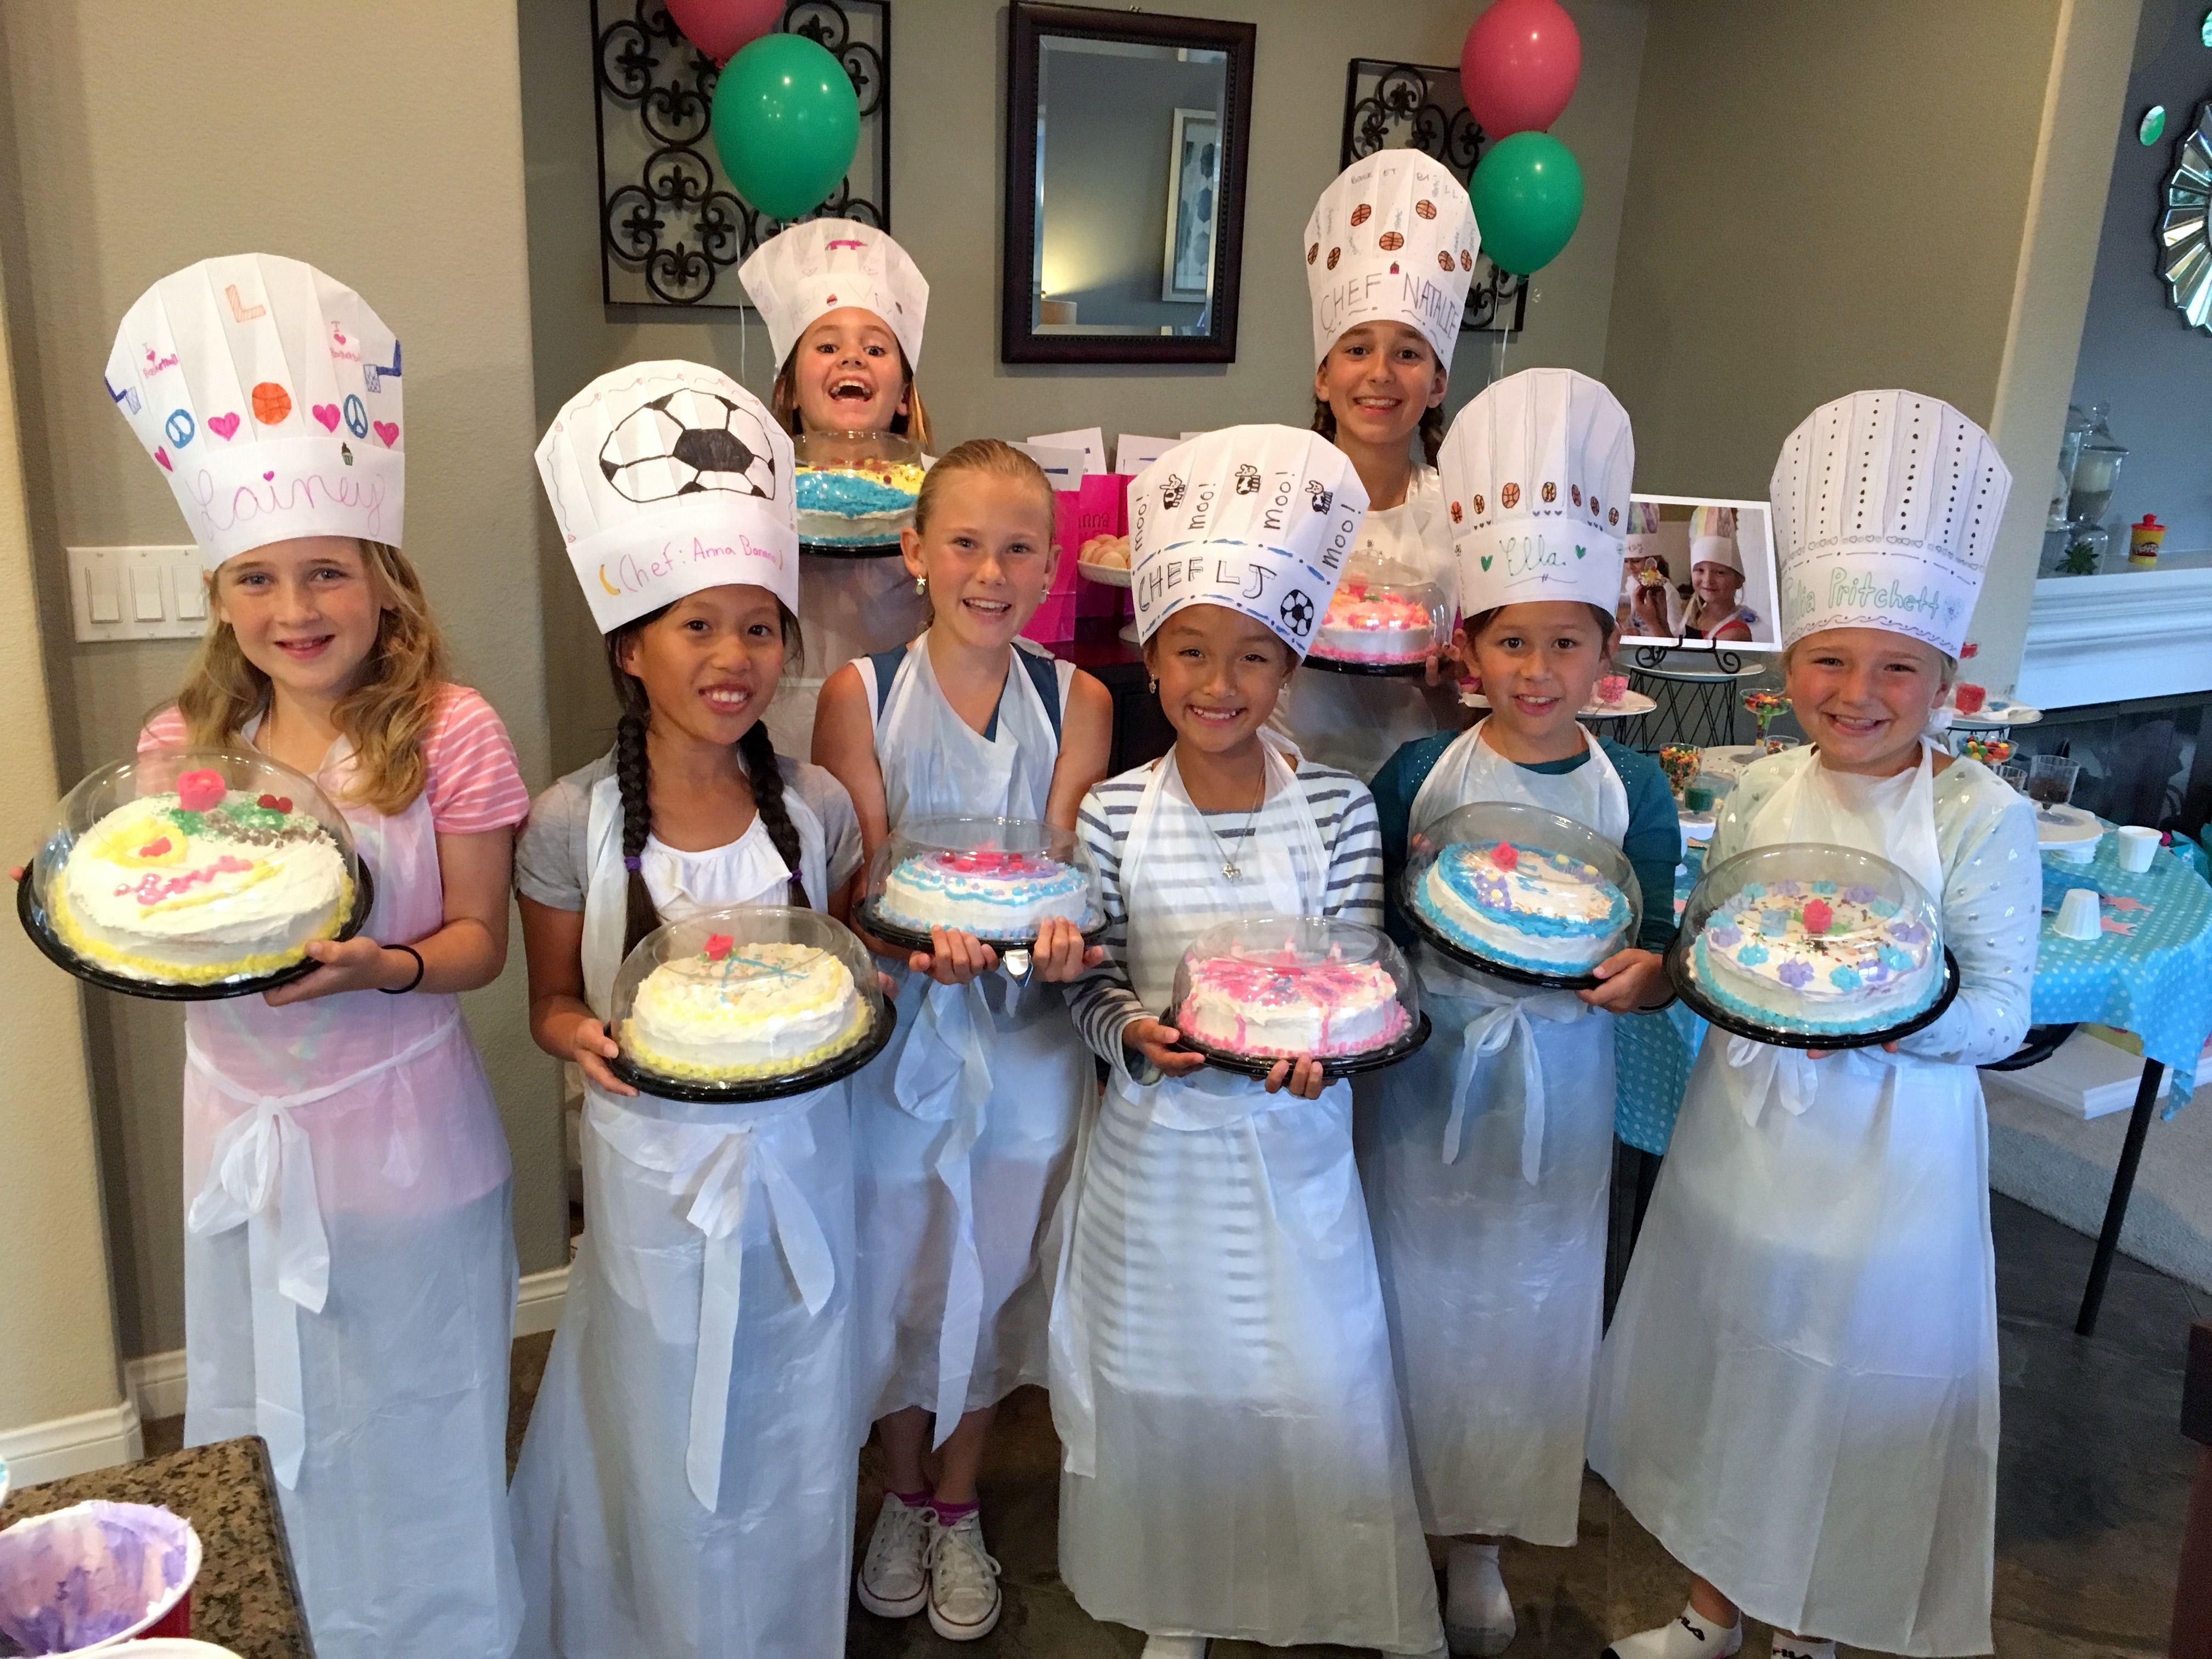 Kids Party Planning Kids Kitchen Birthdays By Artful Chefs 1 Kids Party Planning Unique Birthday Party Ideas Kids Party